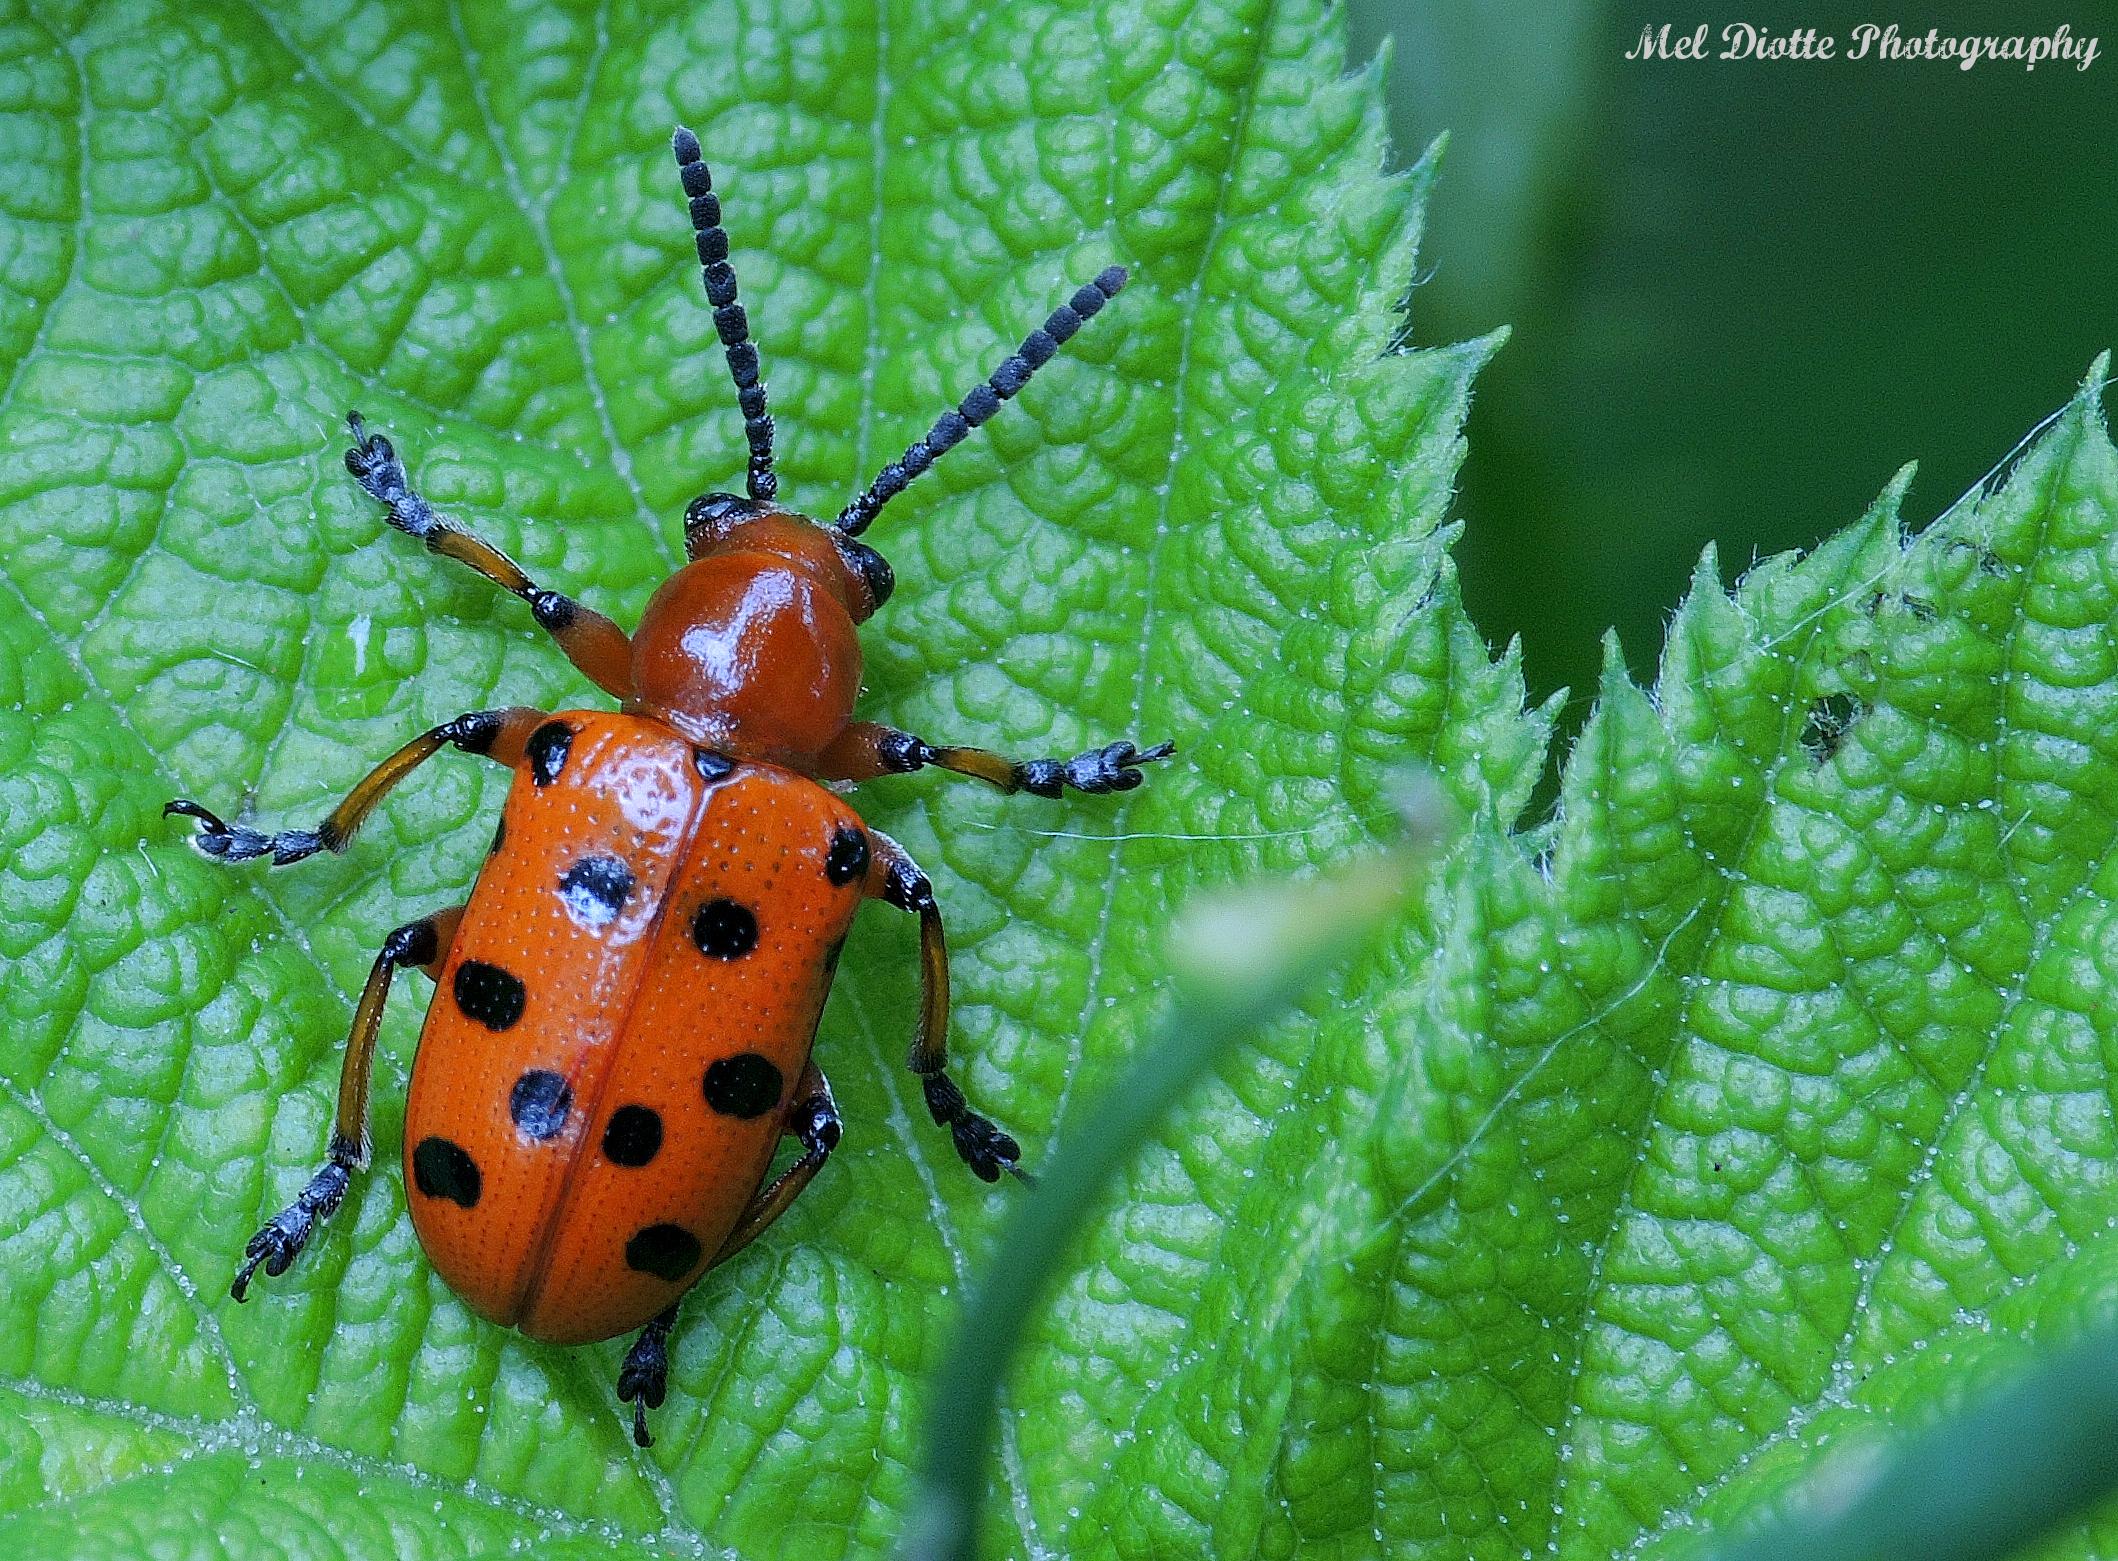 asparagus beetle june 11 2015csigned.jpg